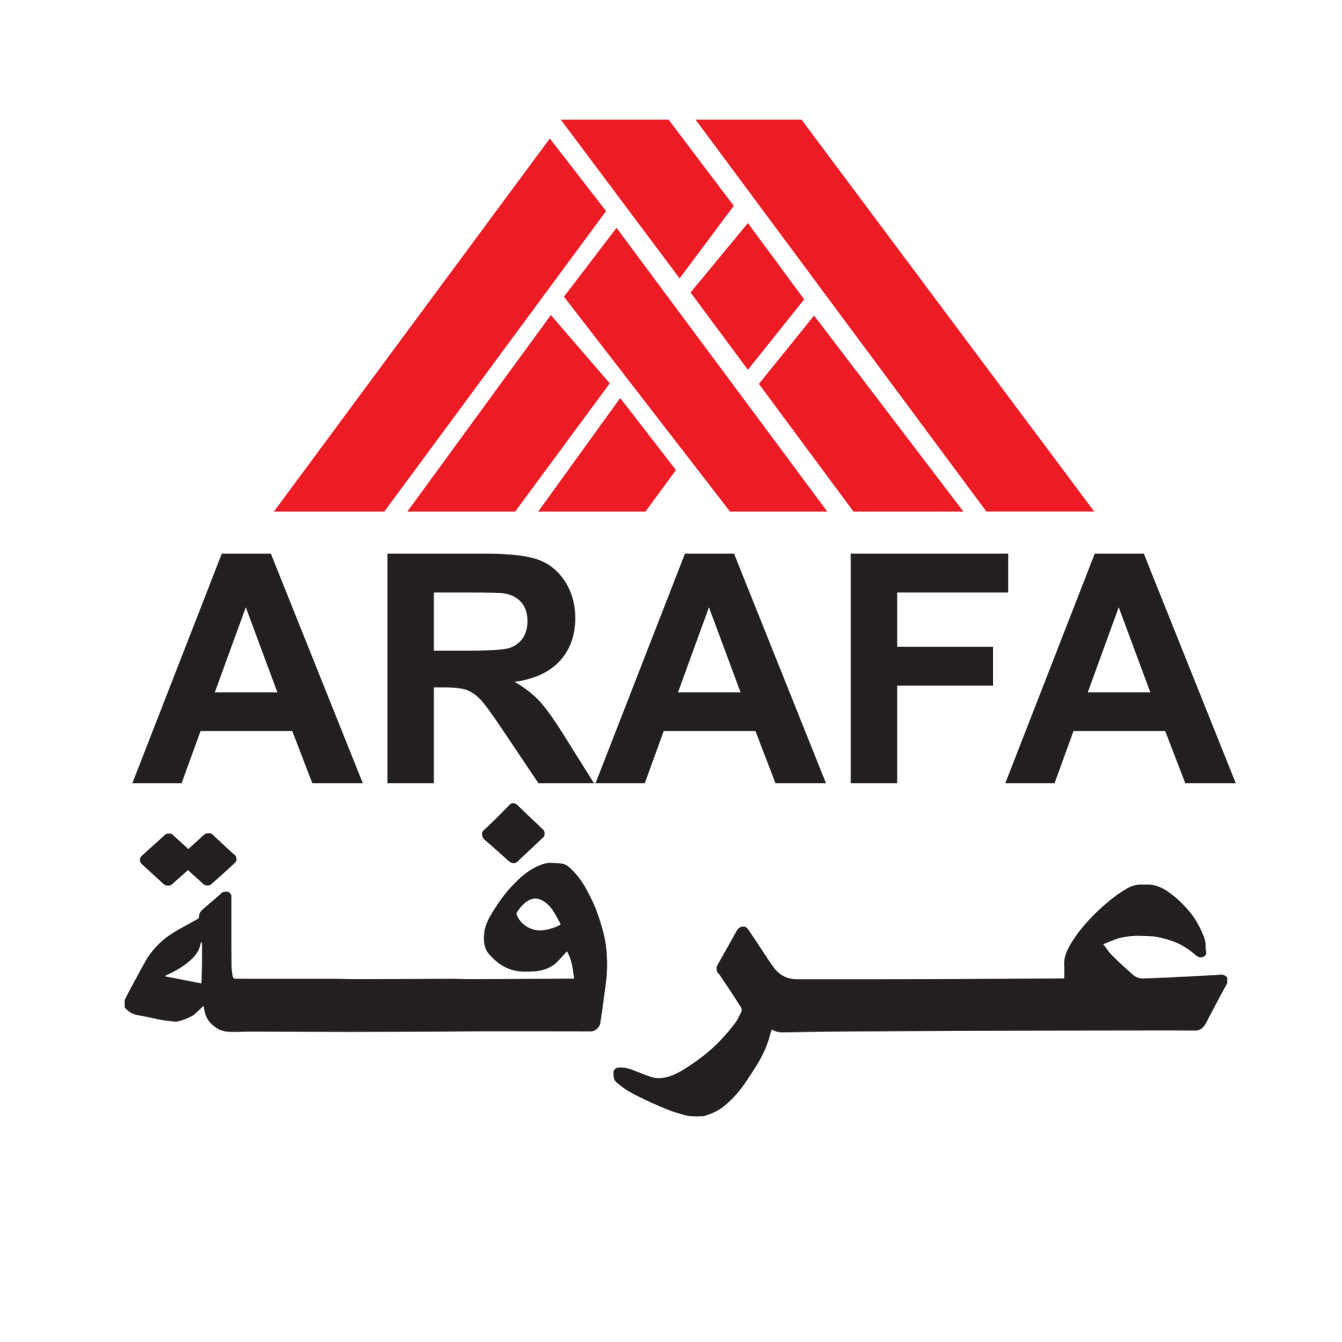 Arafa Stores